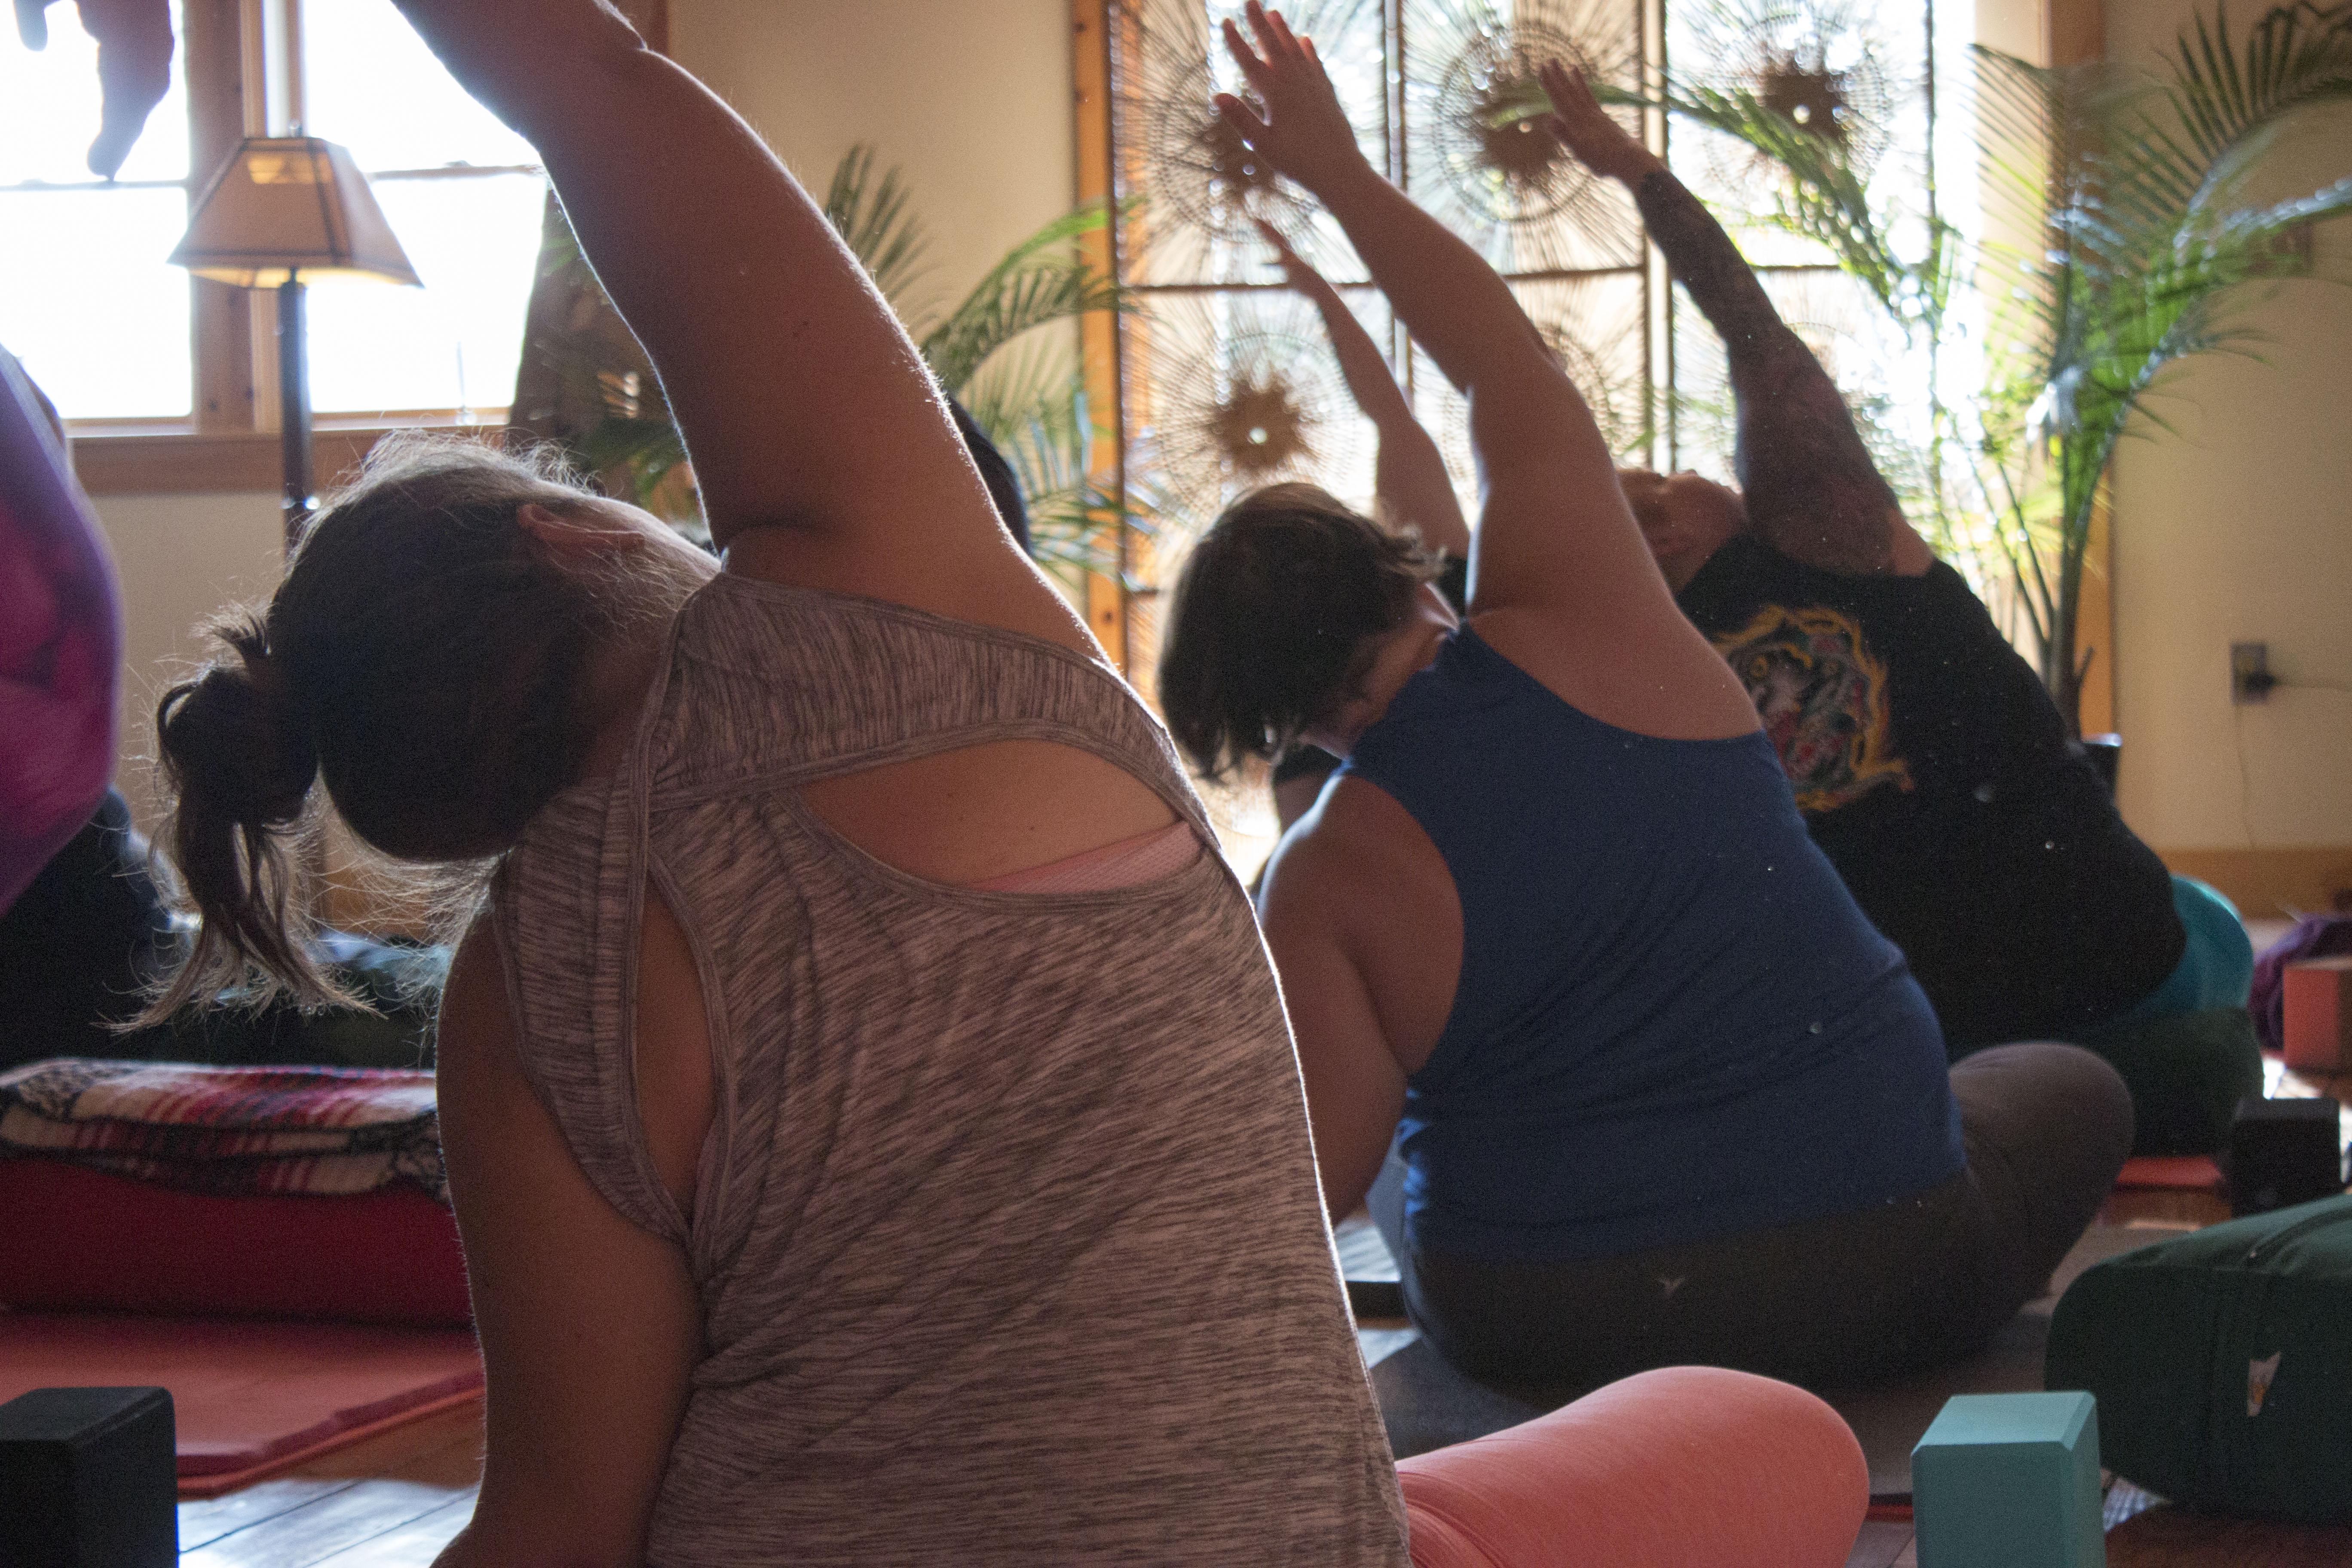 Body Positive Yoga Events